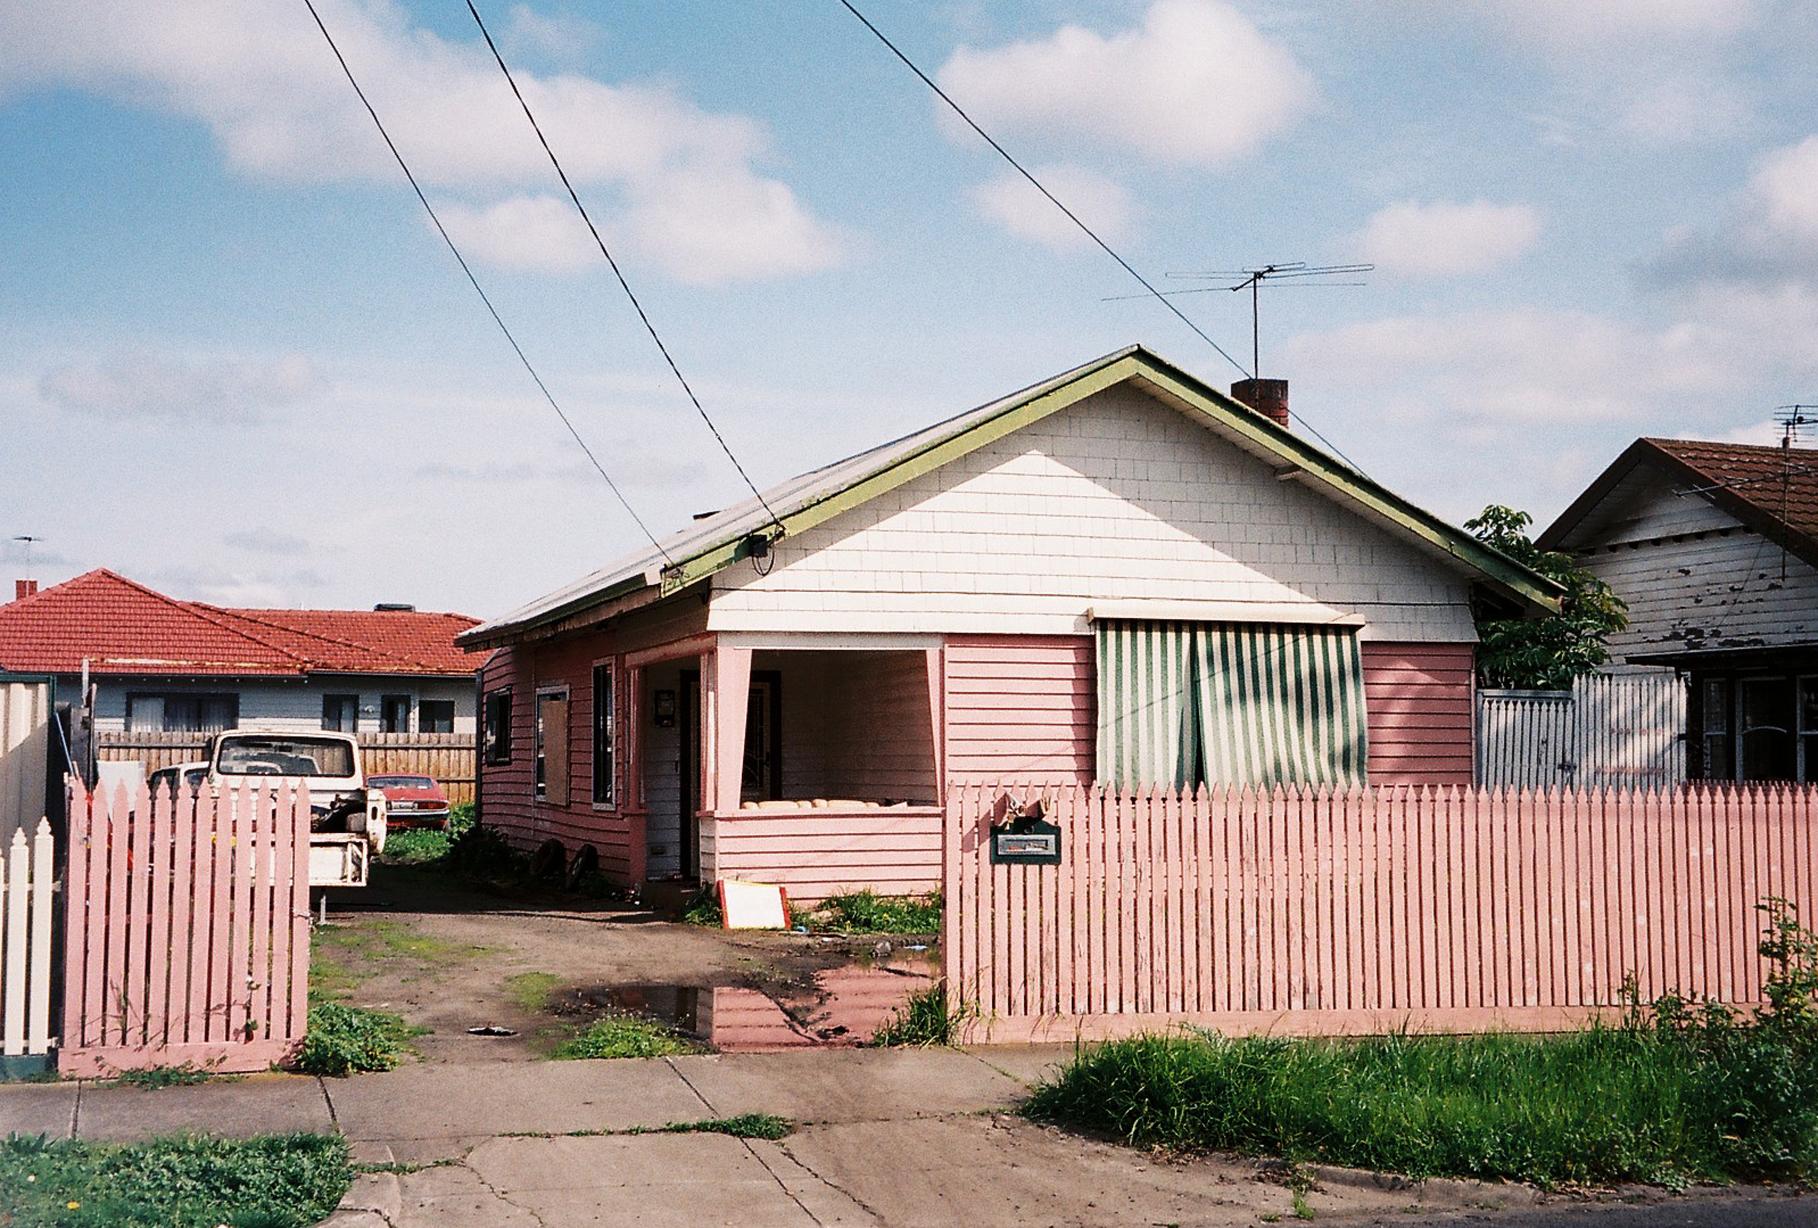 photography suburb melbourne coburb pink house garden